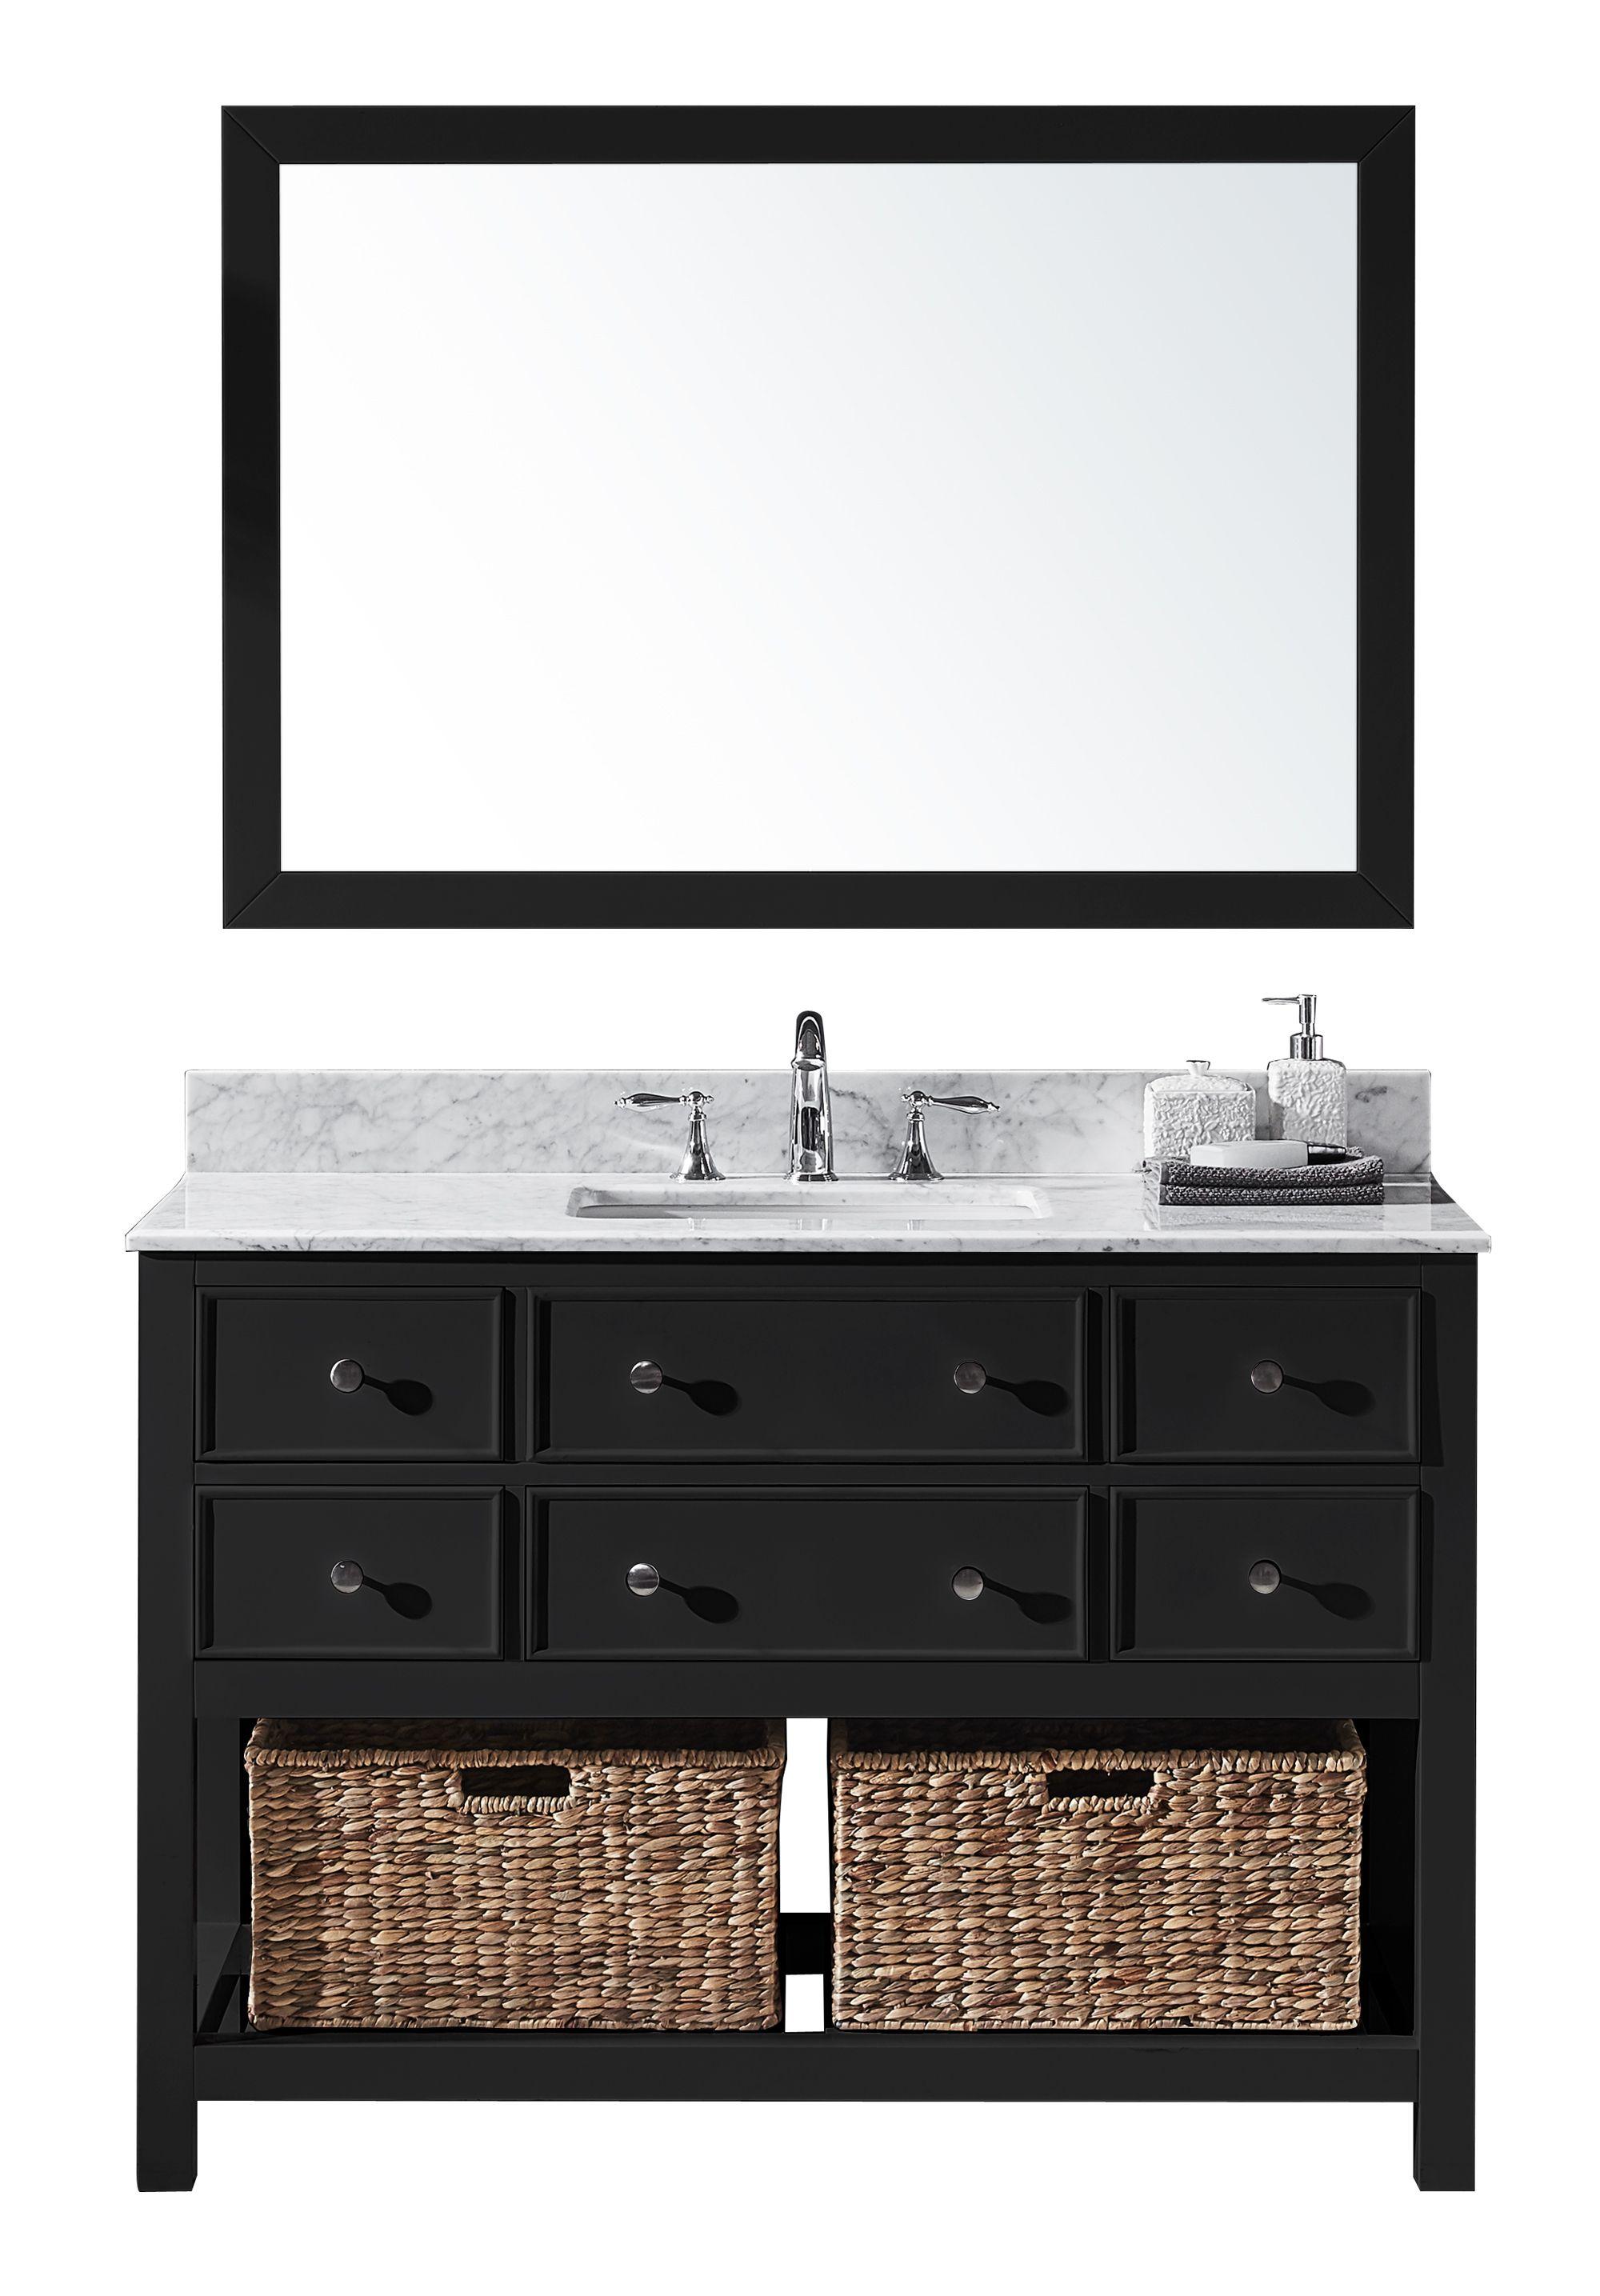 Exclusive Heritage Elodie 48 Single Sink Bathroom Vanity In Espresso With White Carrara Marble Top Bas Single Sink Bathroom Vanity Bathroom Vanity Mirror Set